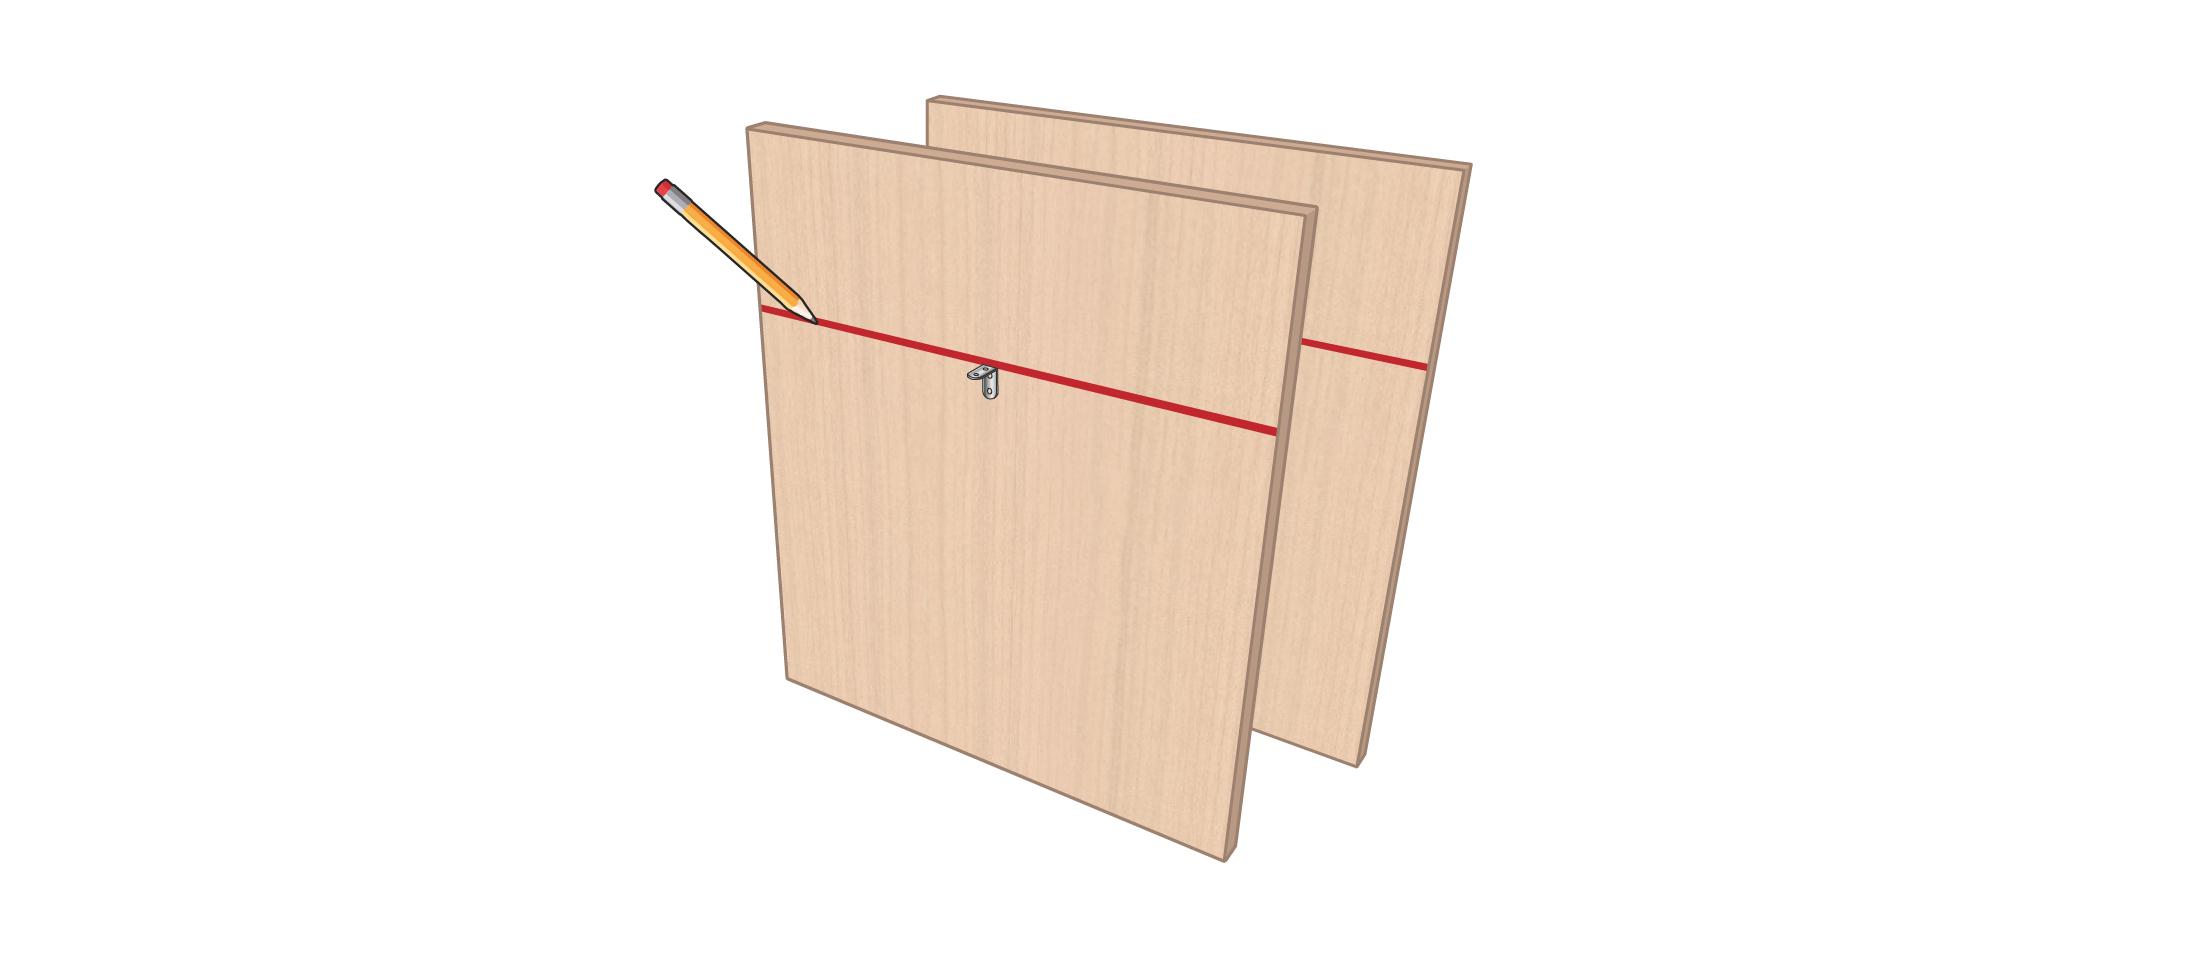 meuble vinyle DIY étape 2